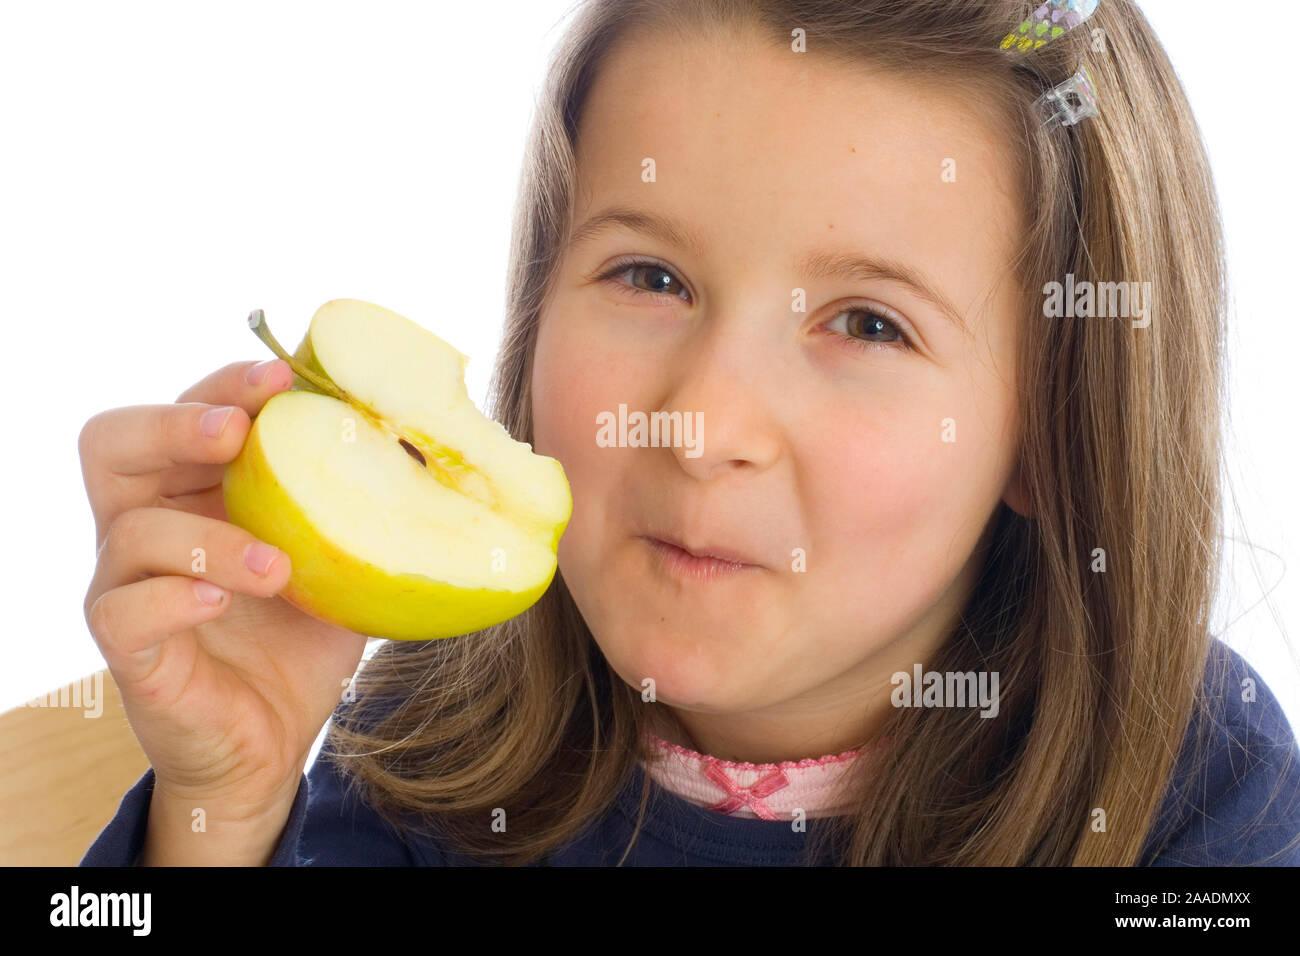 sechsjähriges Mädchen isst Apfel (mr) Stock Photo